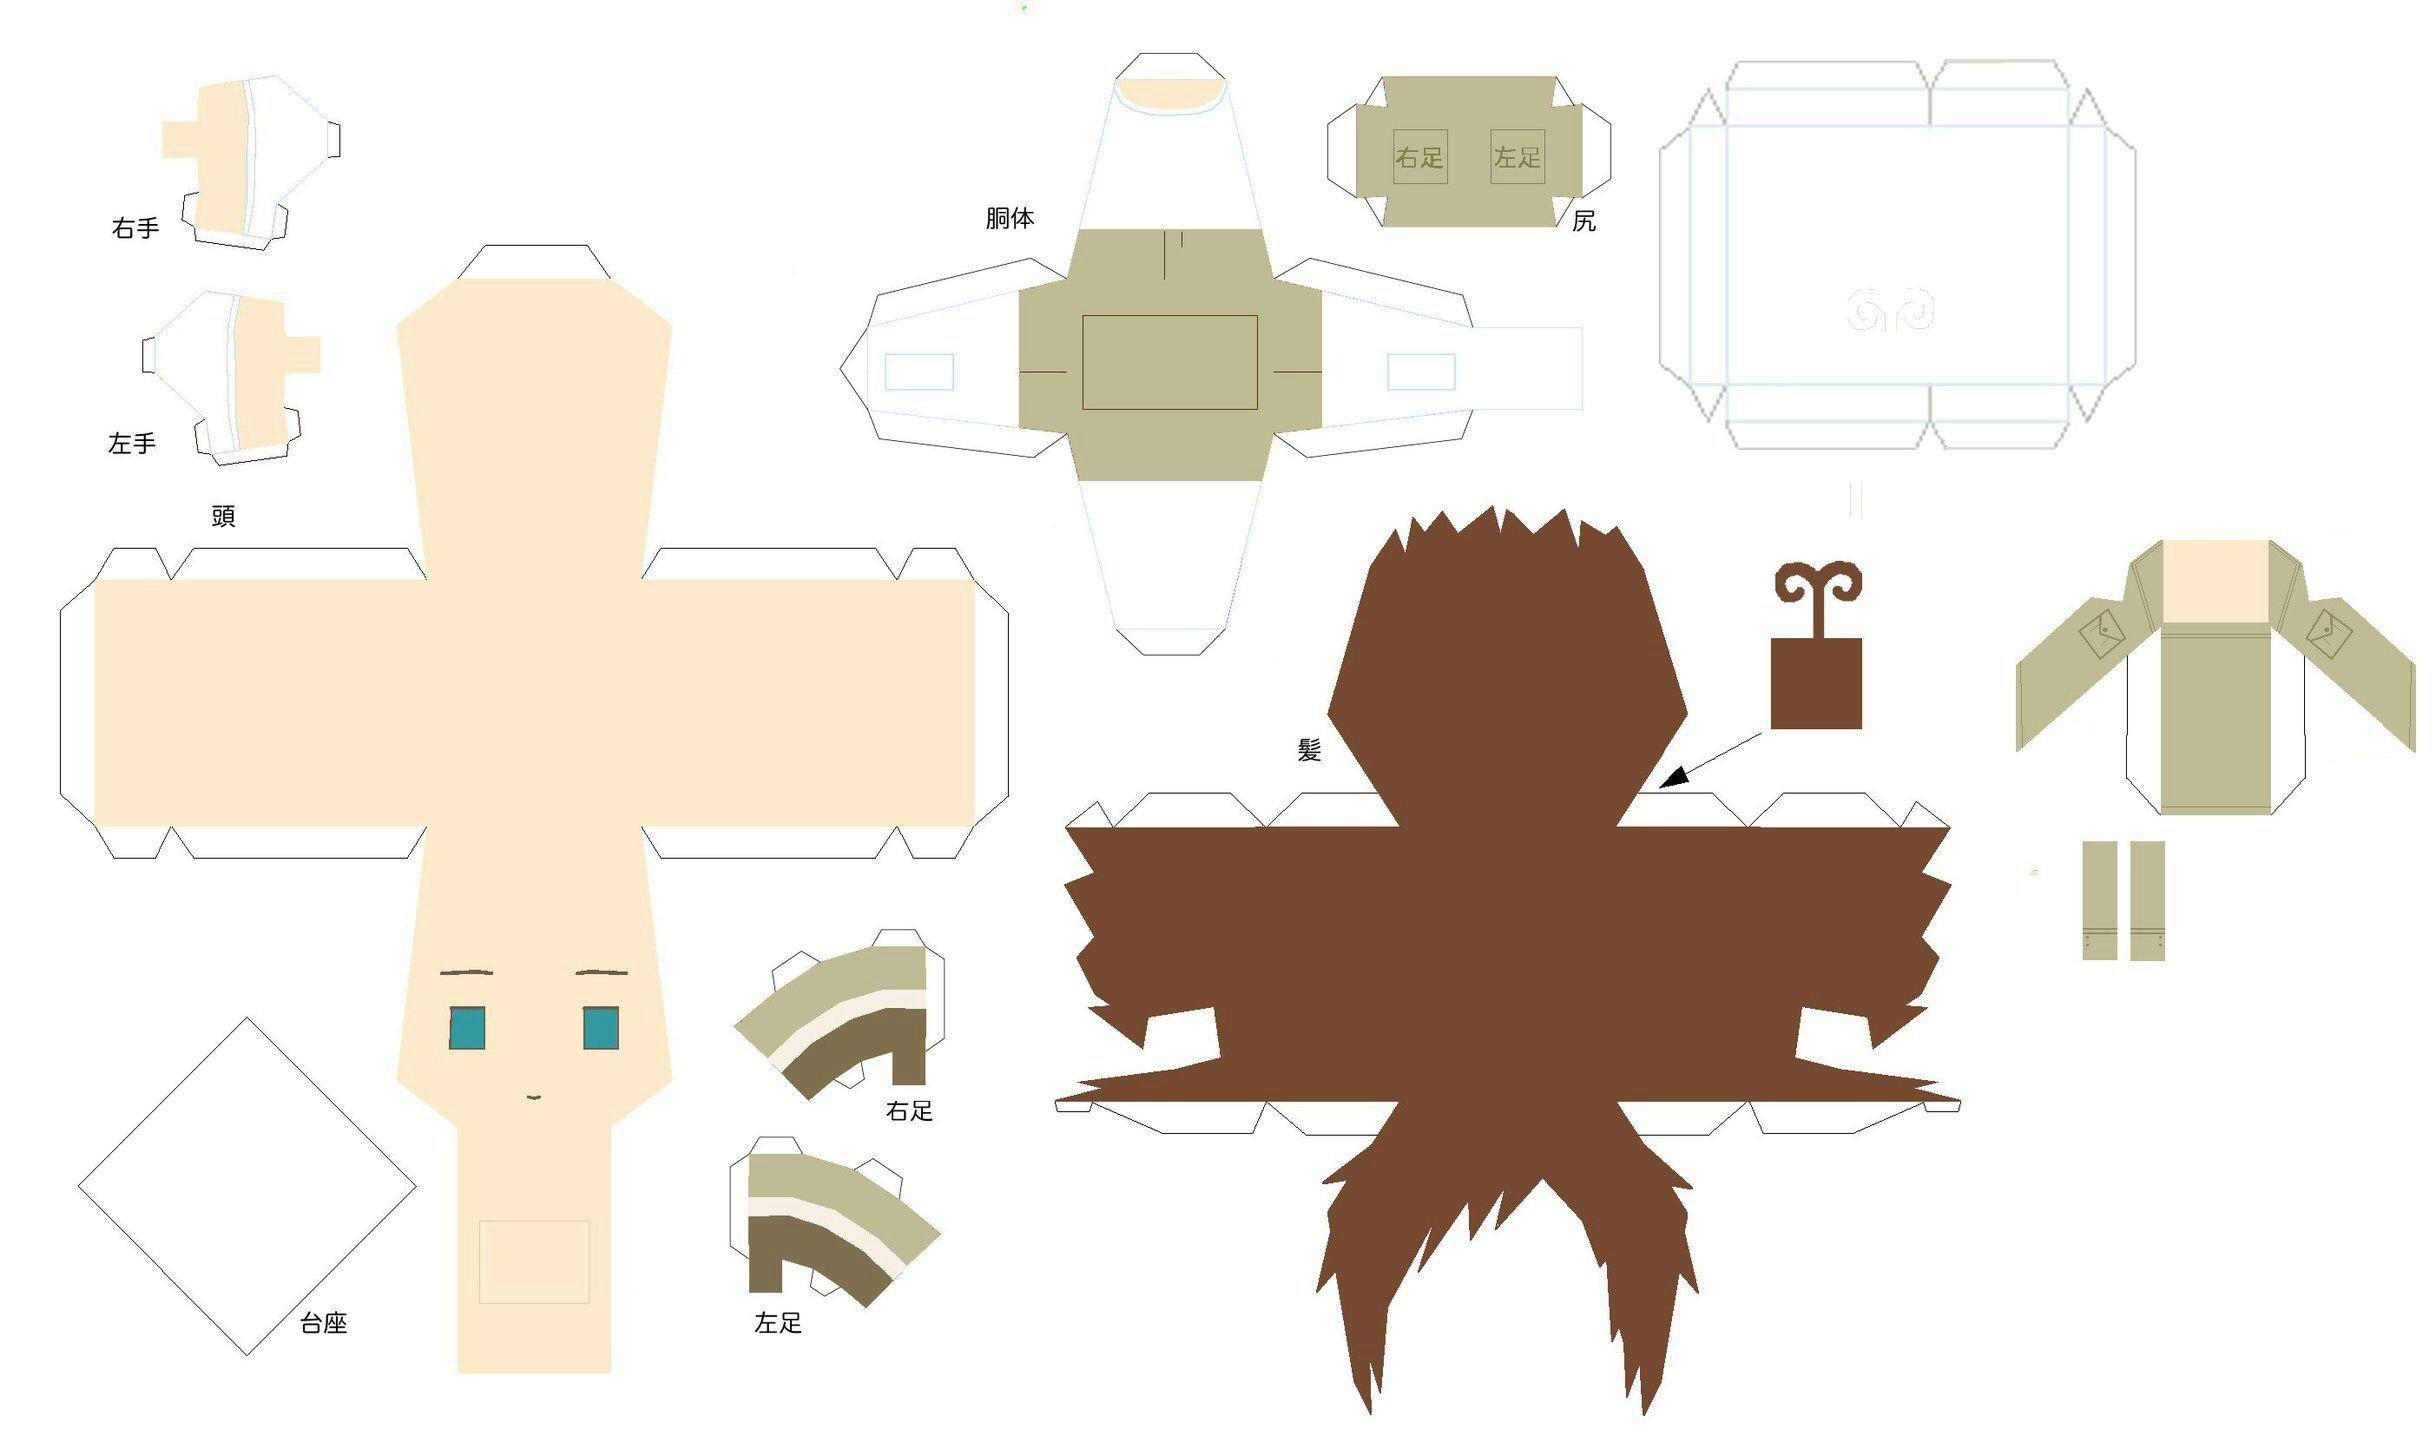 Kuroshitsuji Papercraft 圖片來源: